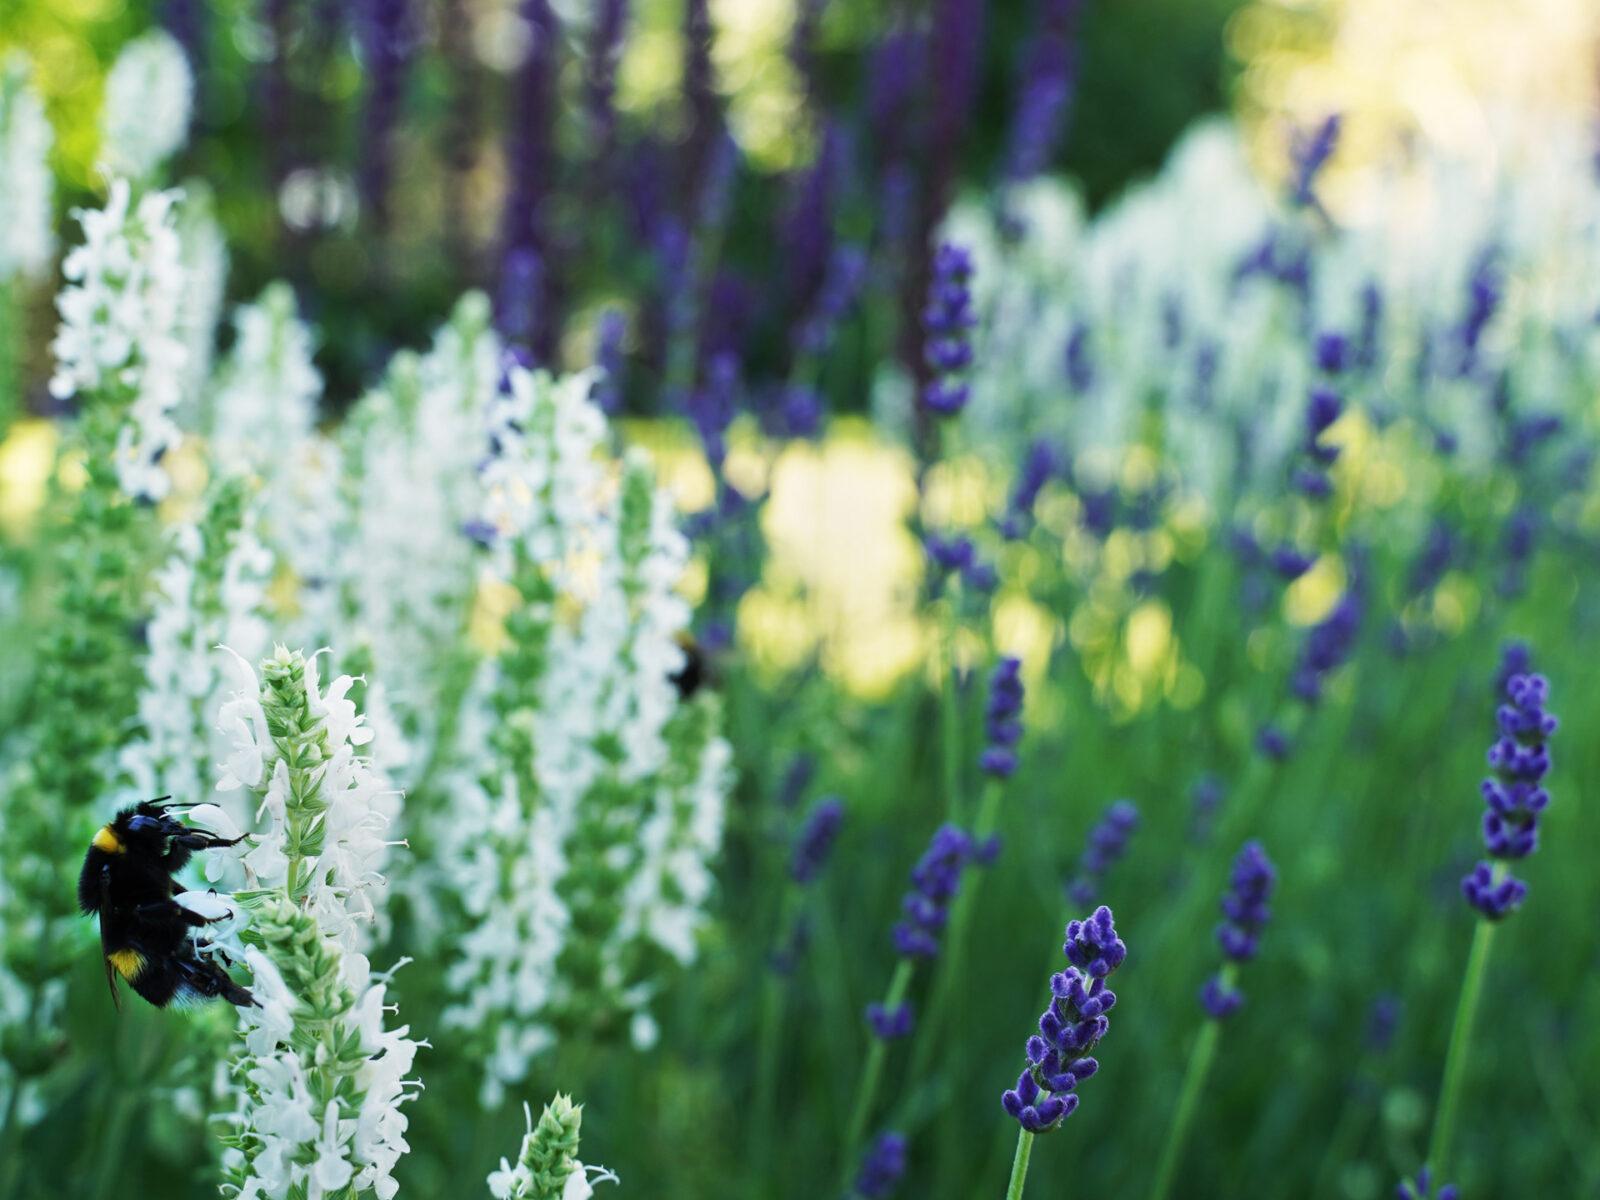 humla, salvia, bin, kryddträdgård